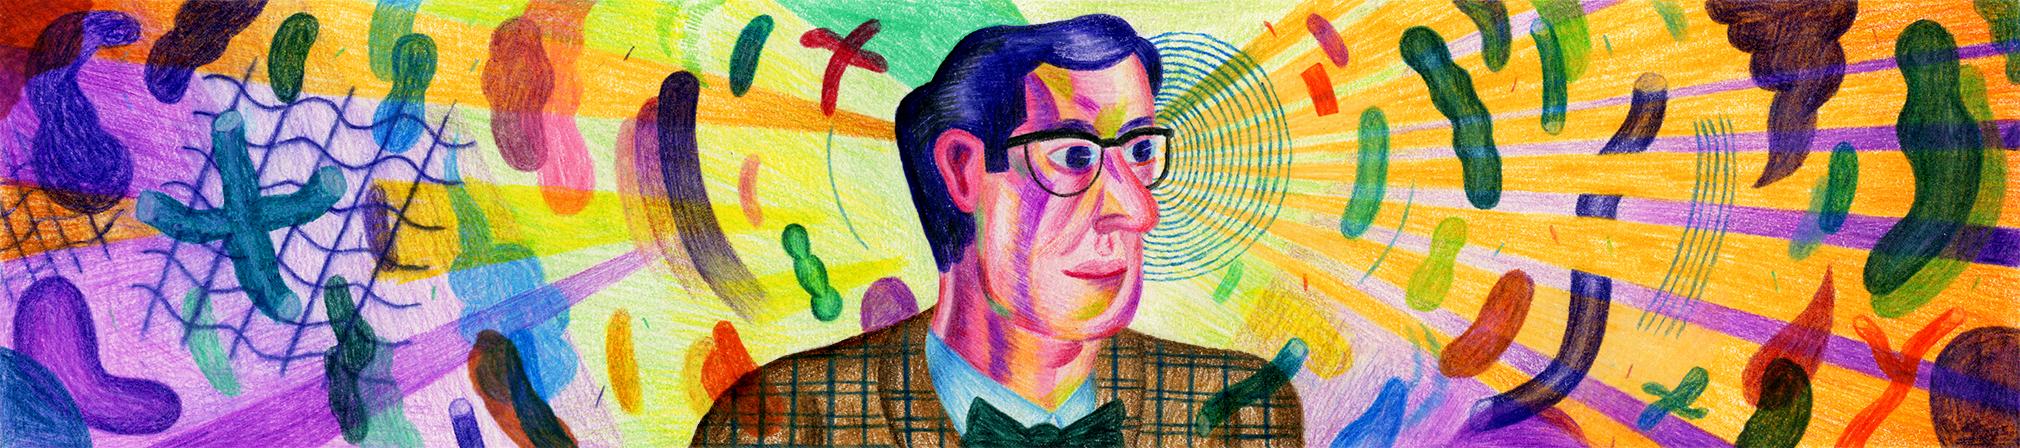 012 Asimovx2020sw2020 Isaac Asimov Essays Essay Awful On Creativity Intelligence Full